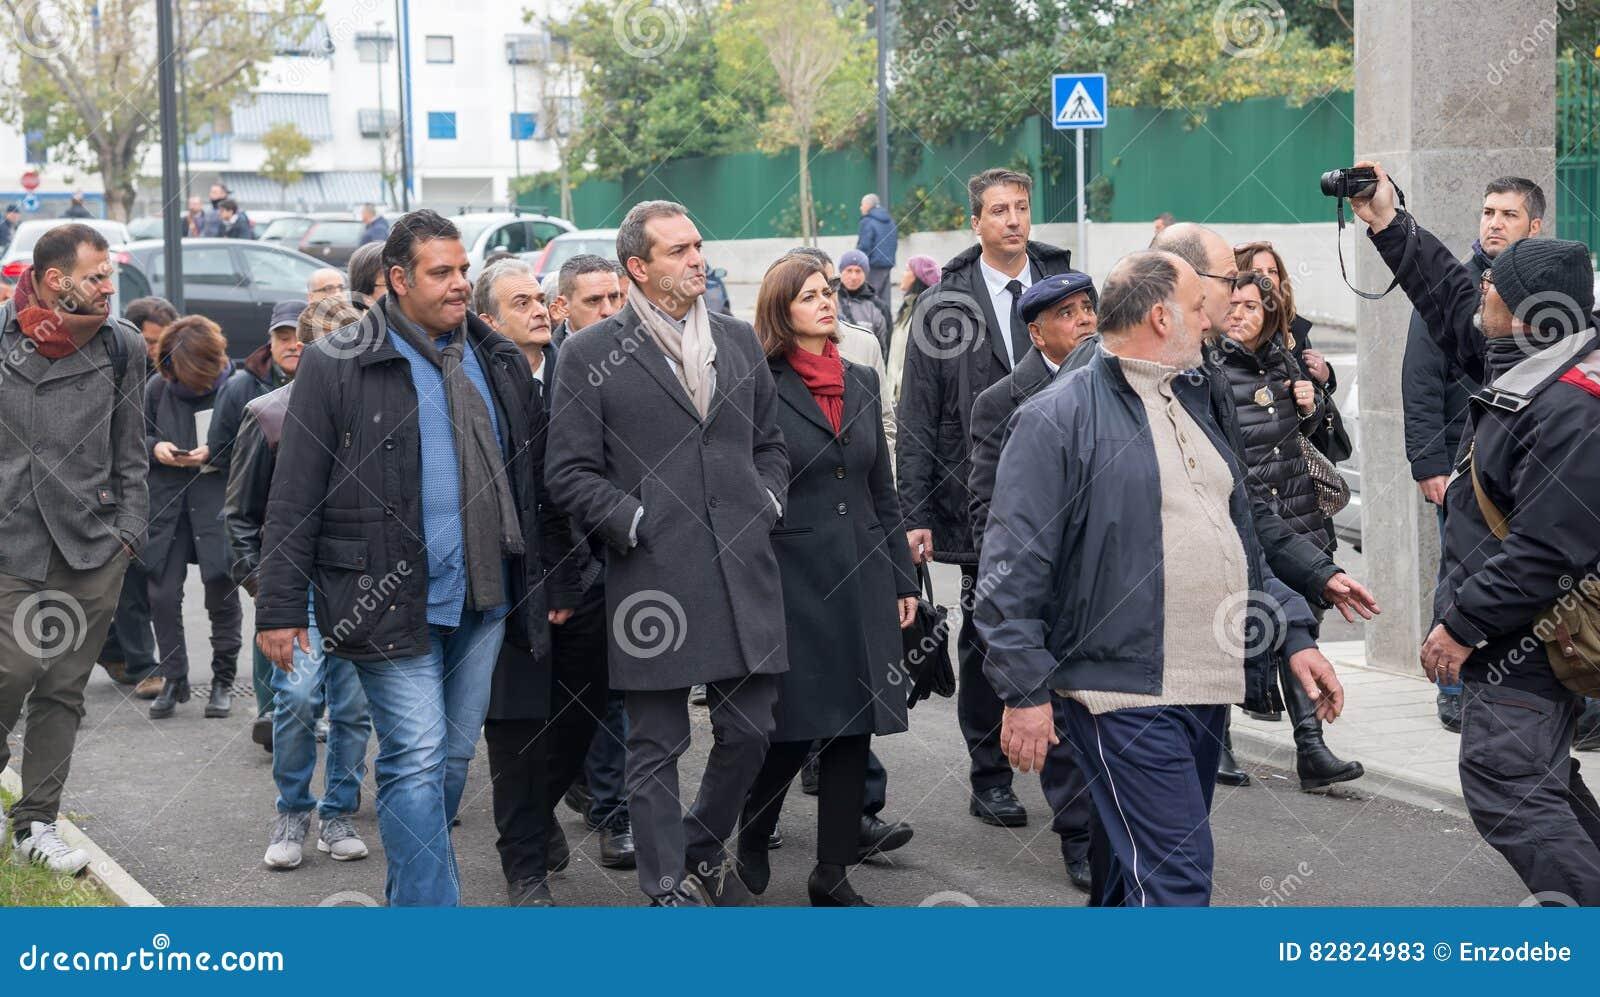 italian people meet